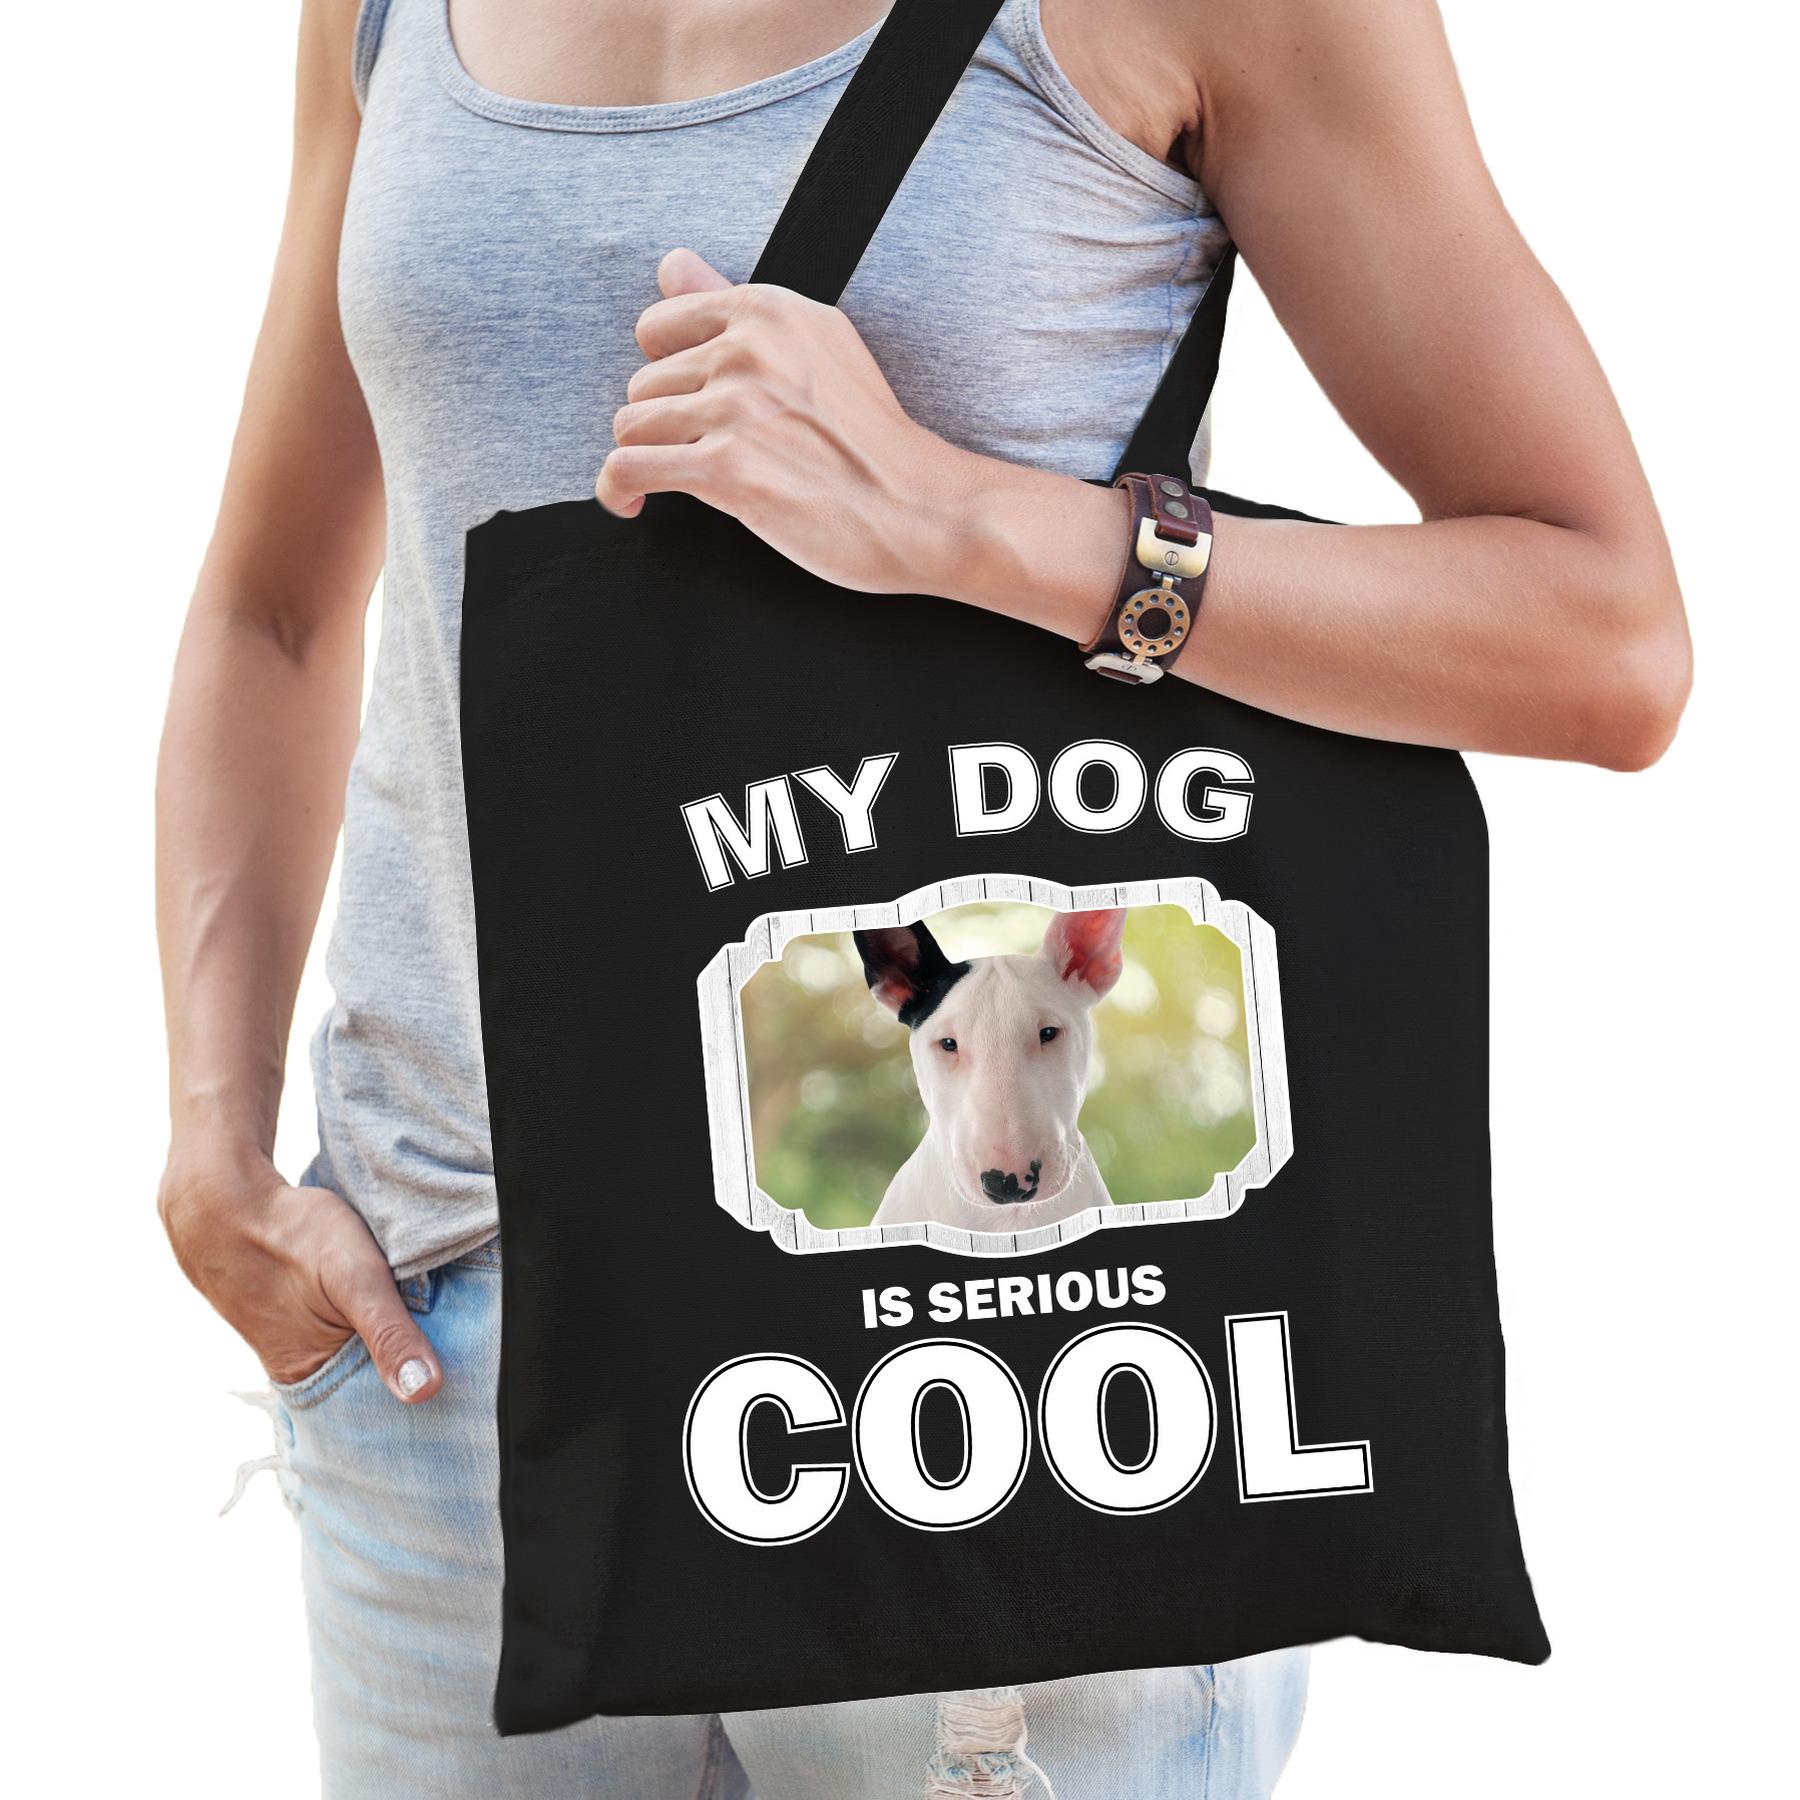 Katoenen tasje my dog is serious cool zwart - Bullterrier honden cadeau tas